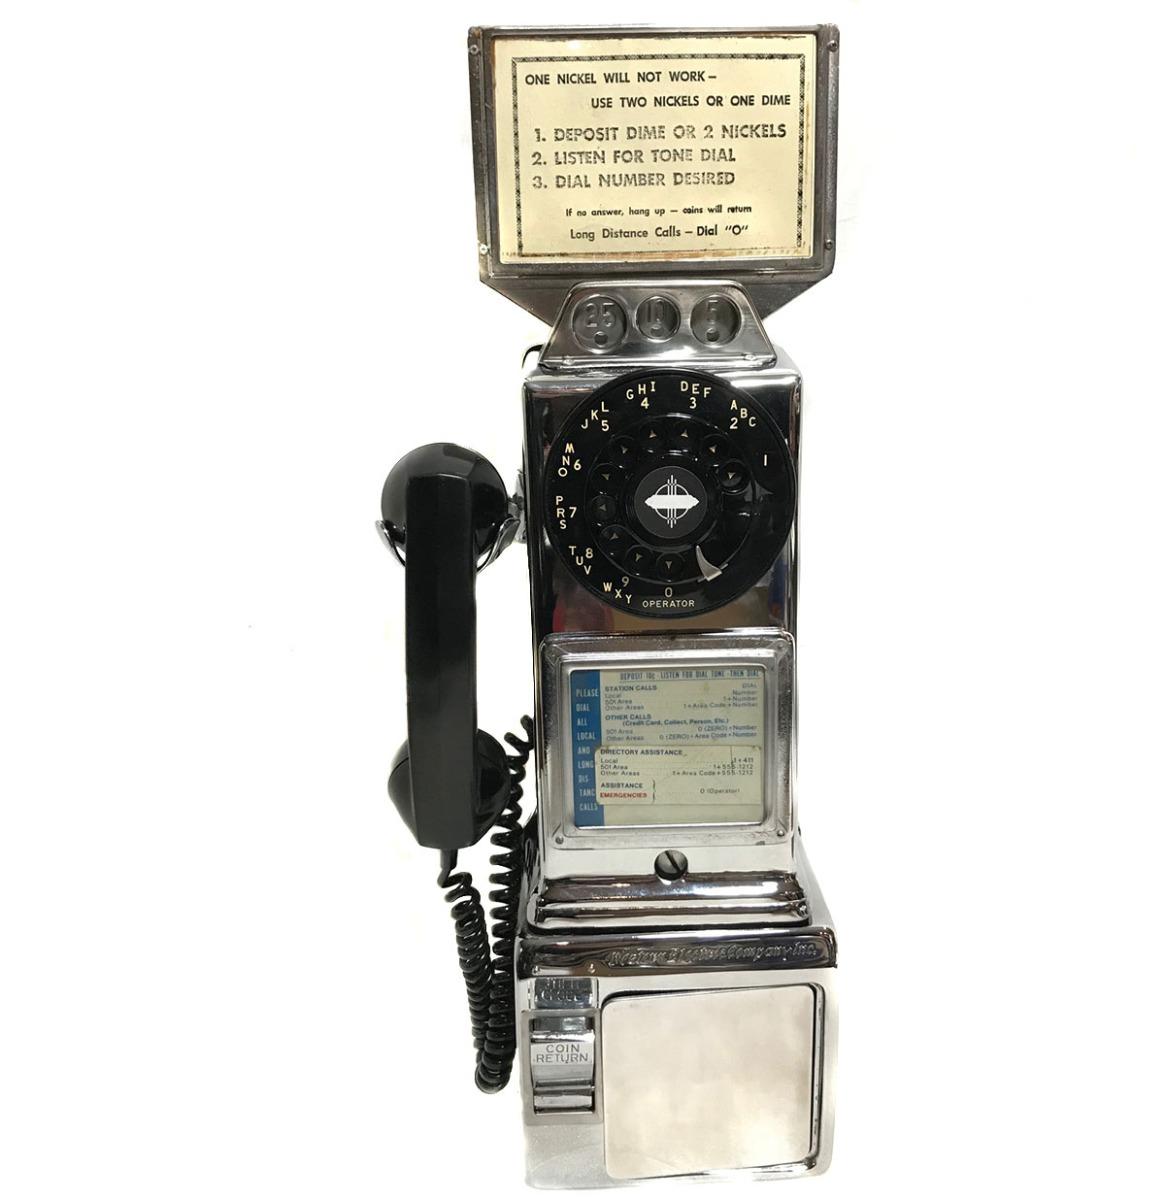 Chrome Wandtelefoon / Payphone 50's